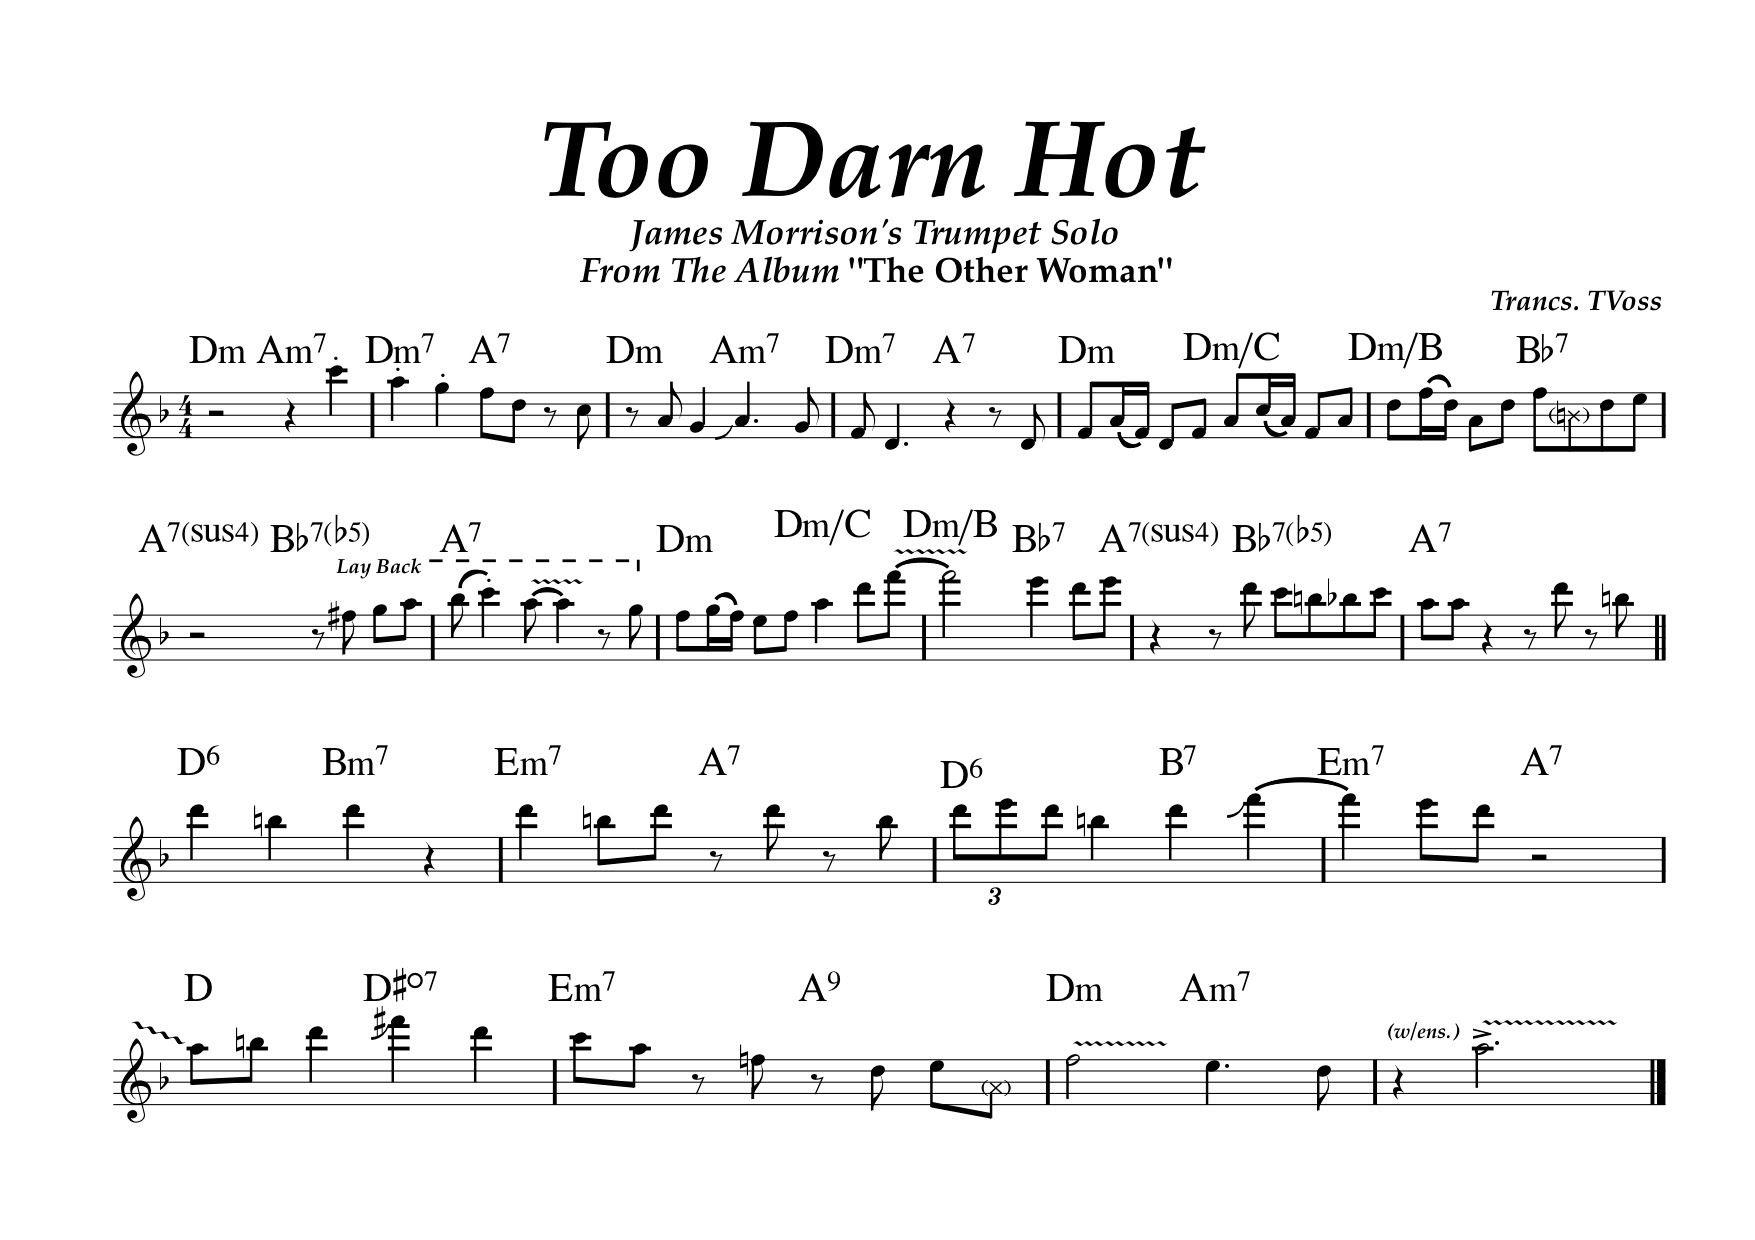 James Morrison: Too Darn Hot (Trumpet Solo Transcription) | Trumpets